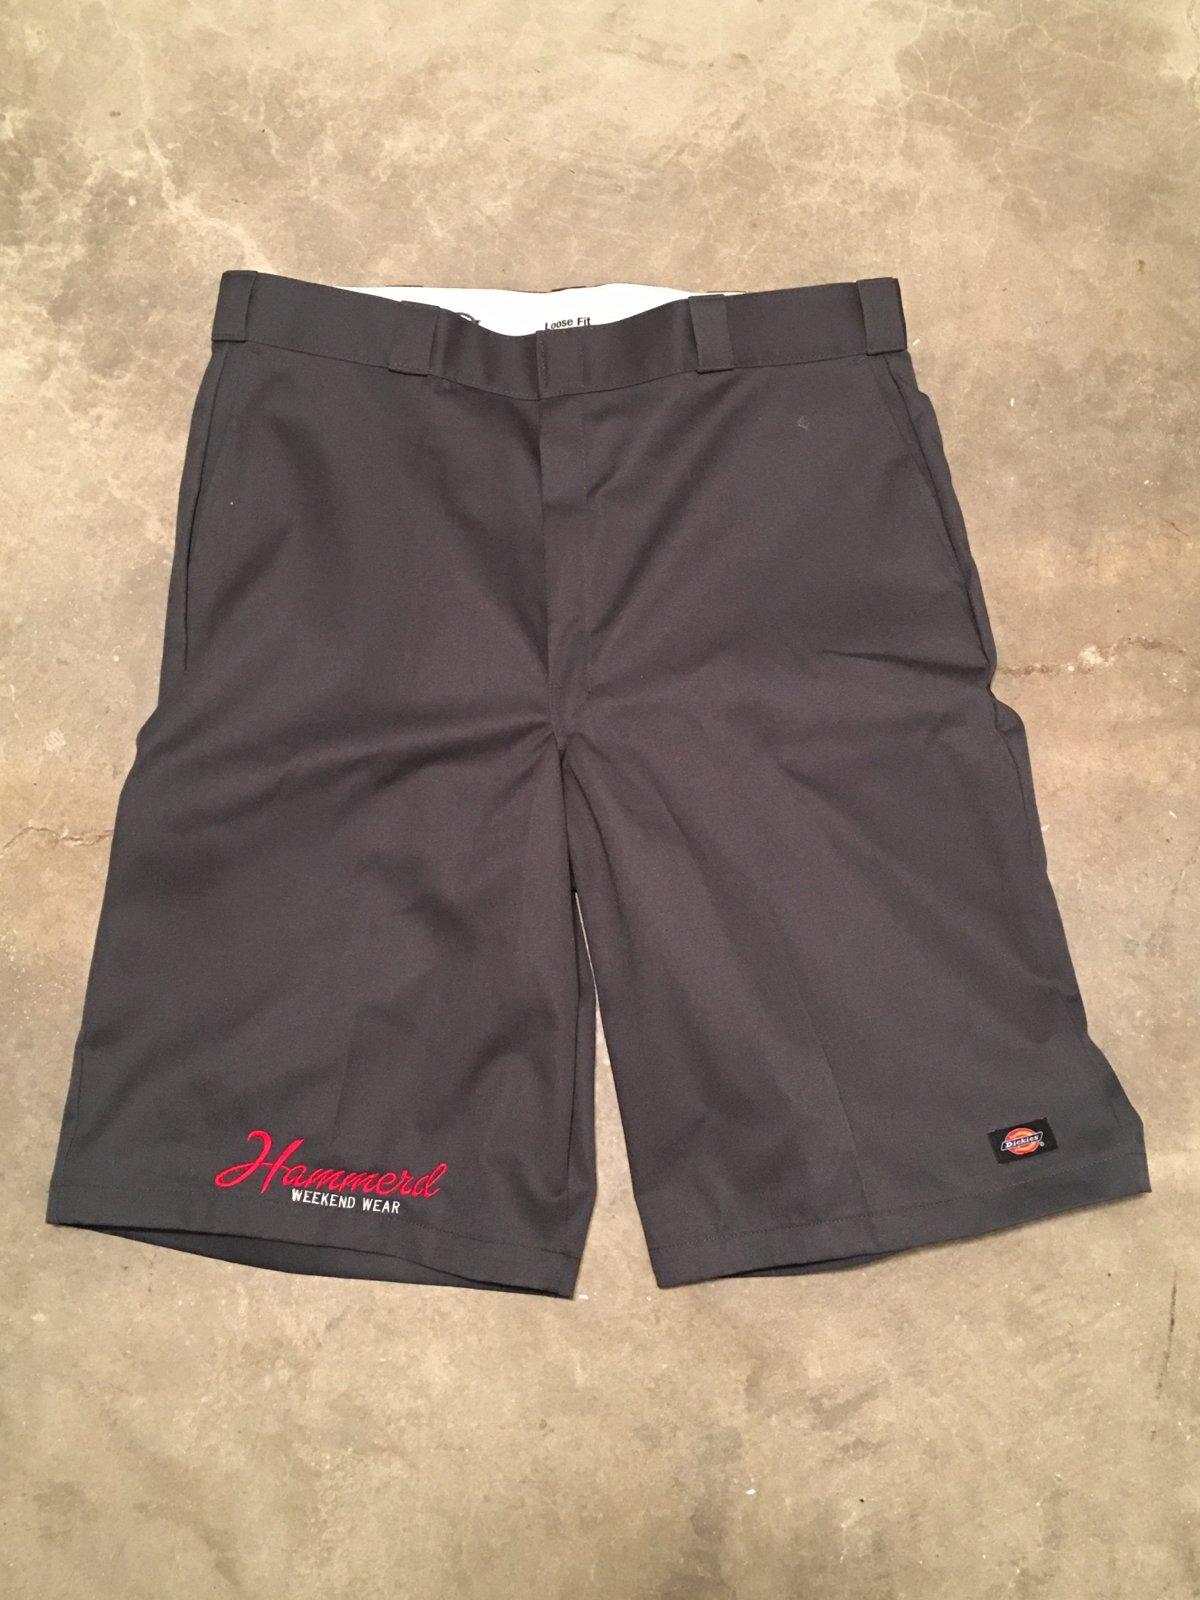 Image of HammerD Dickies shorts